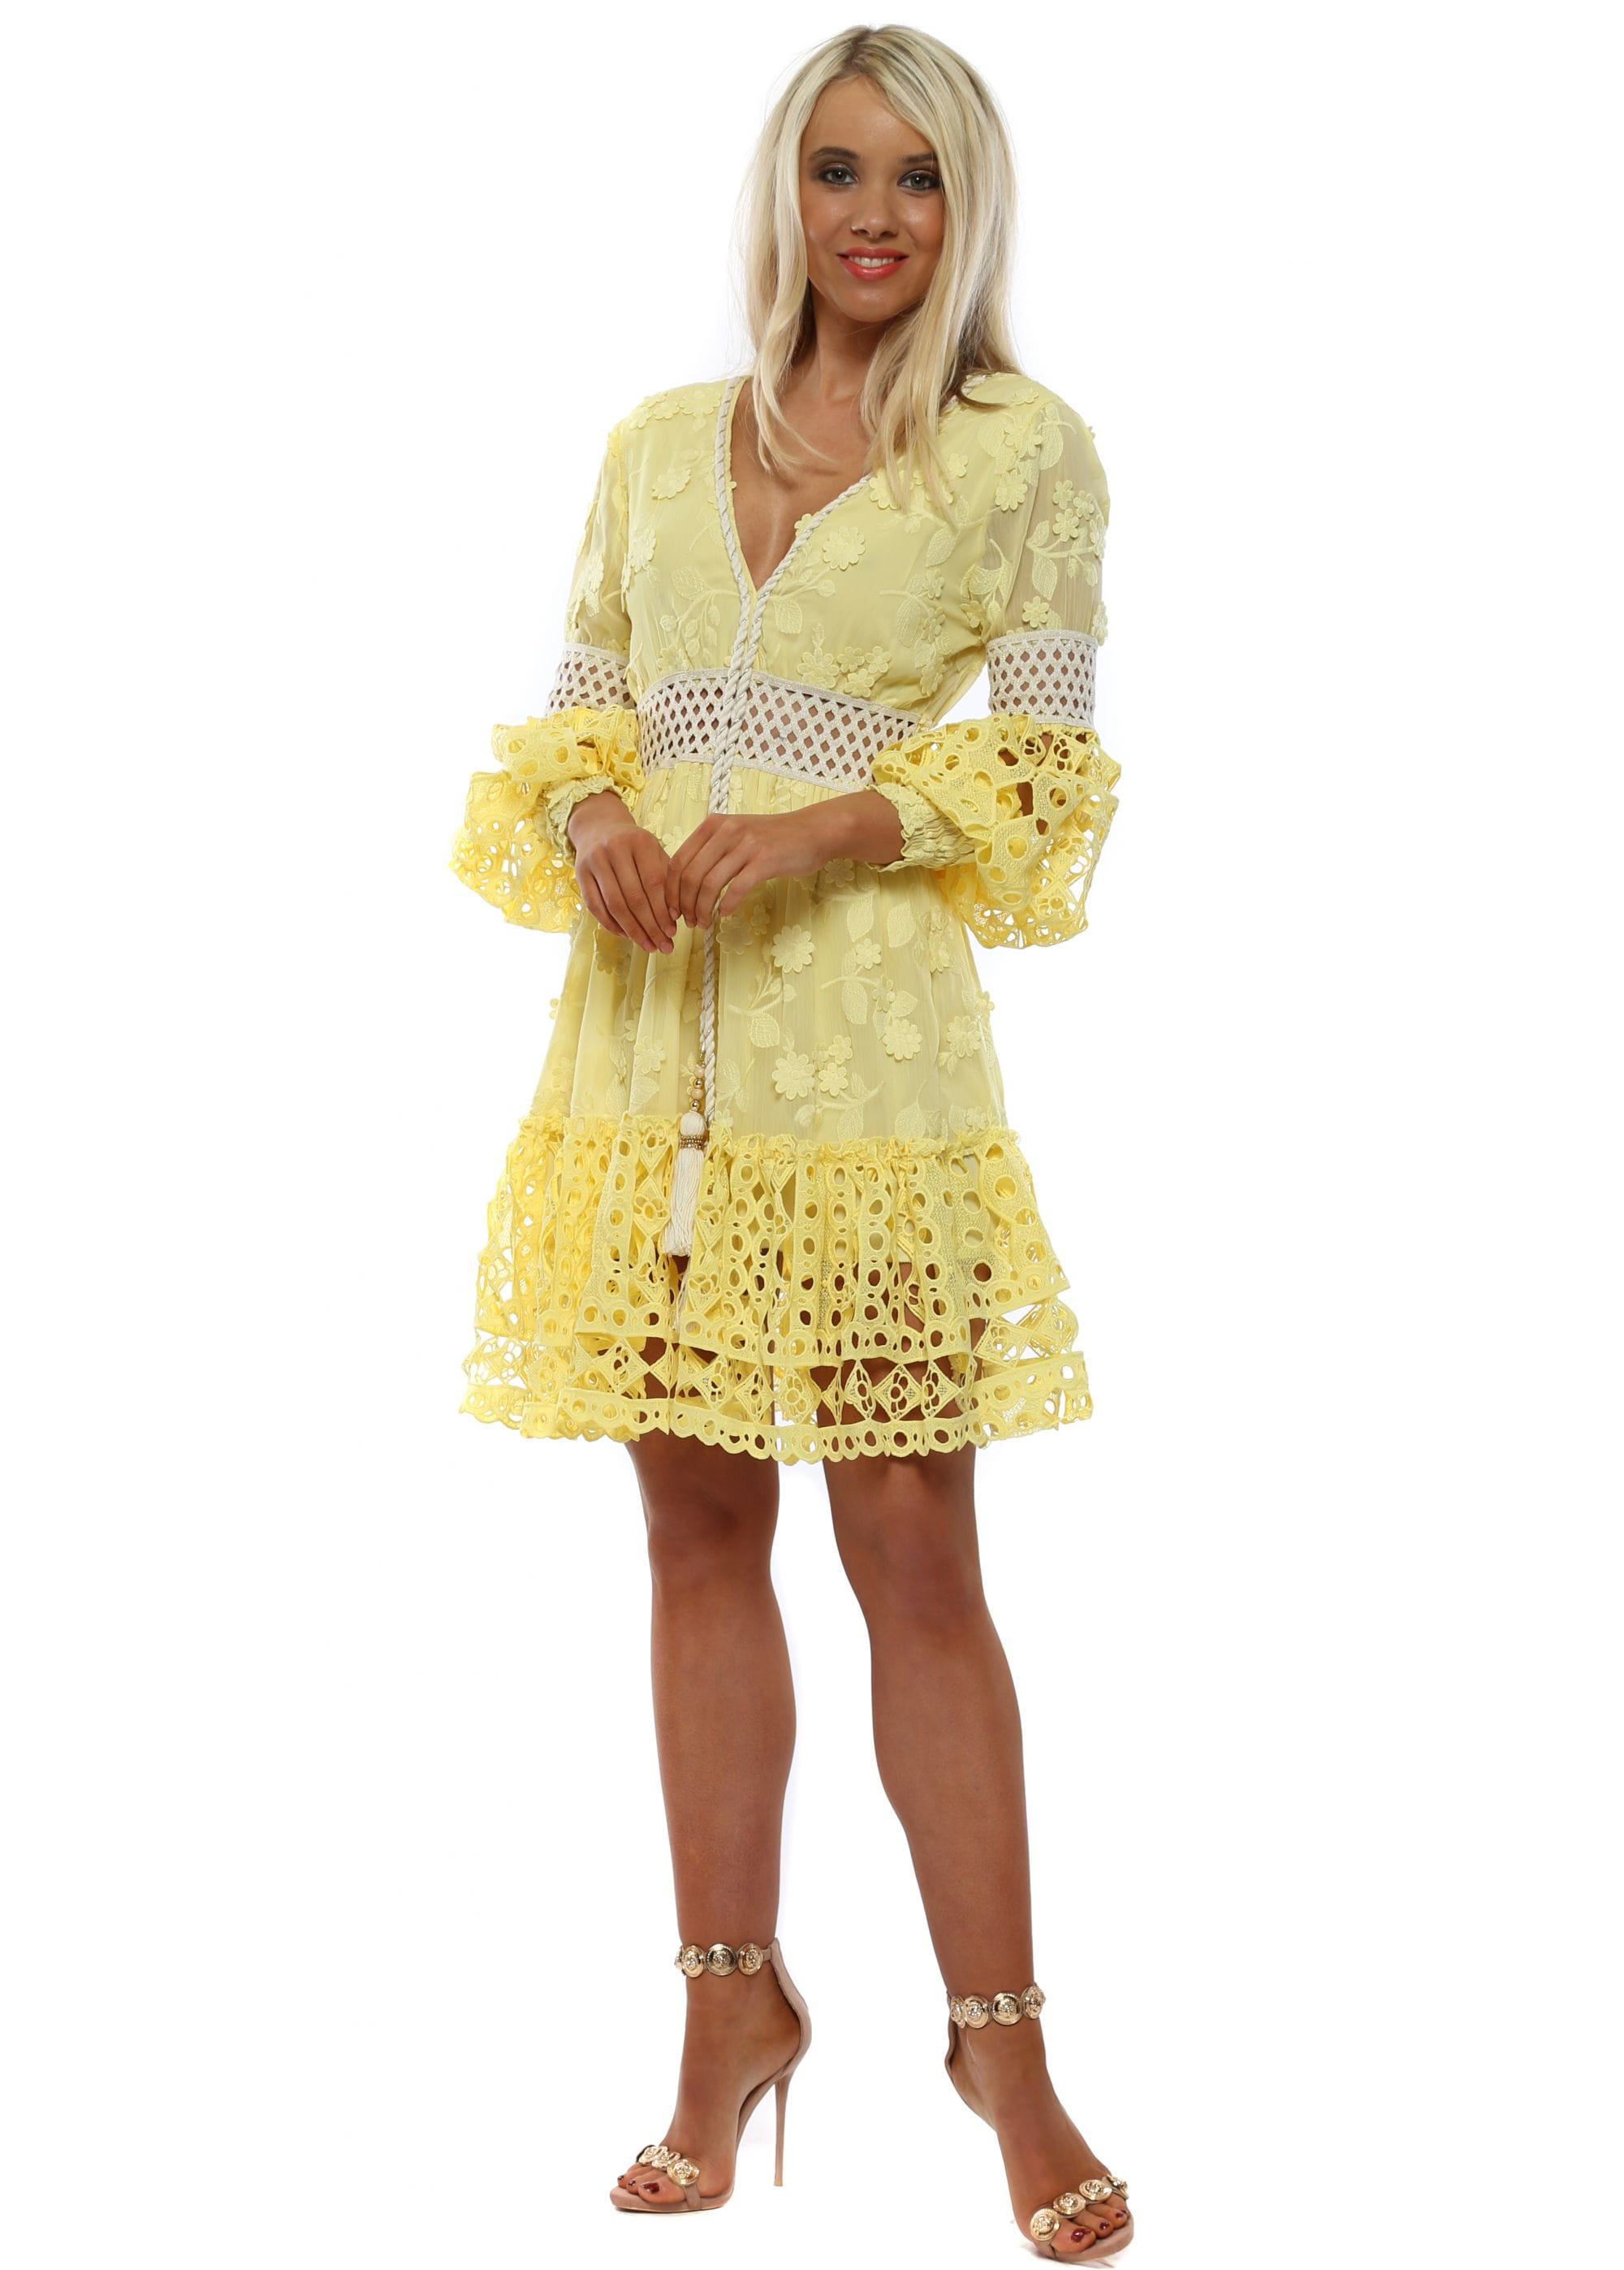 74f403b6c2e3 Yellow Floral Crochet Lace Midi Dress